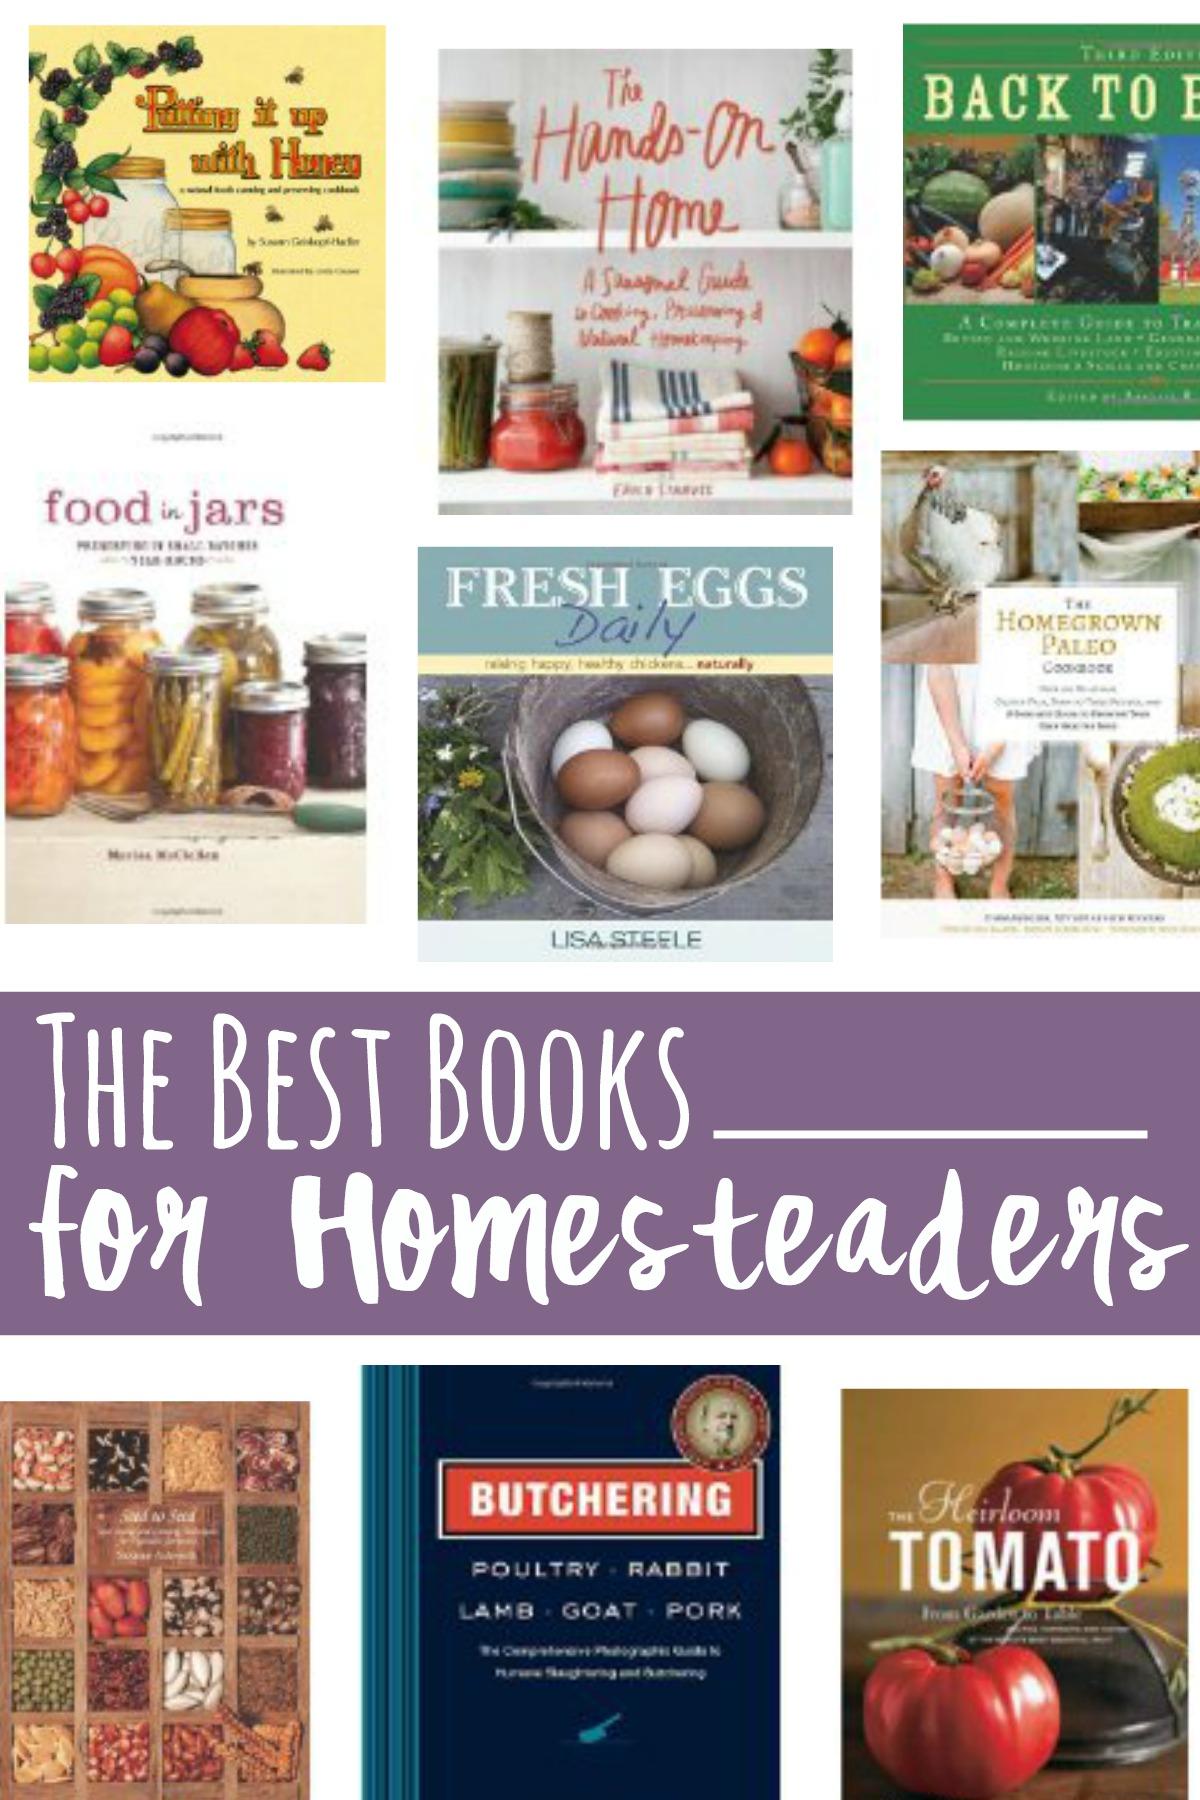 The Best Books for Homesteaders